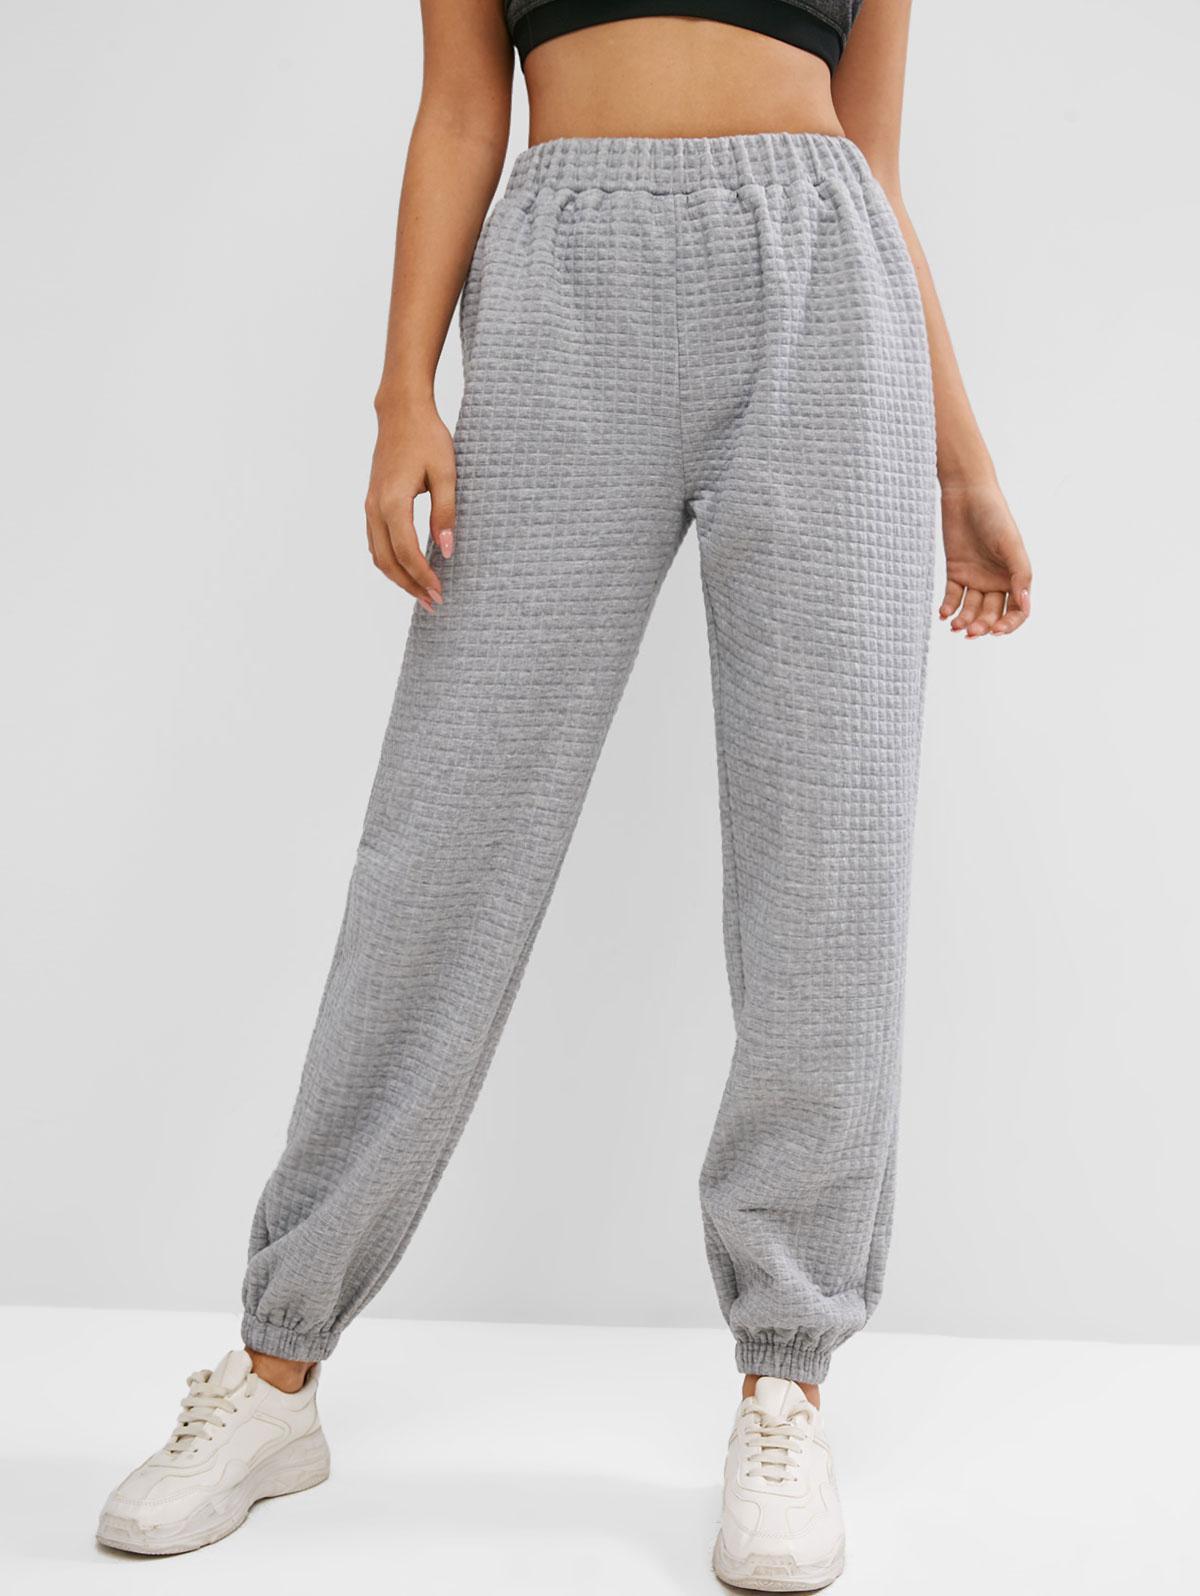 ZAFUL High Waisted Plain Sweatpants